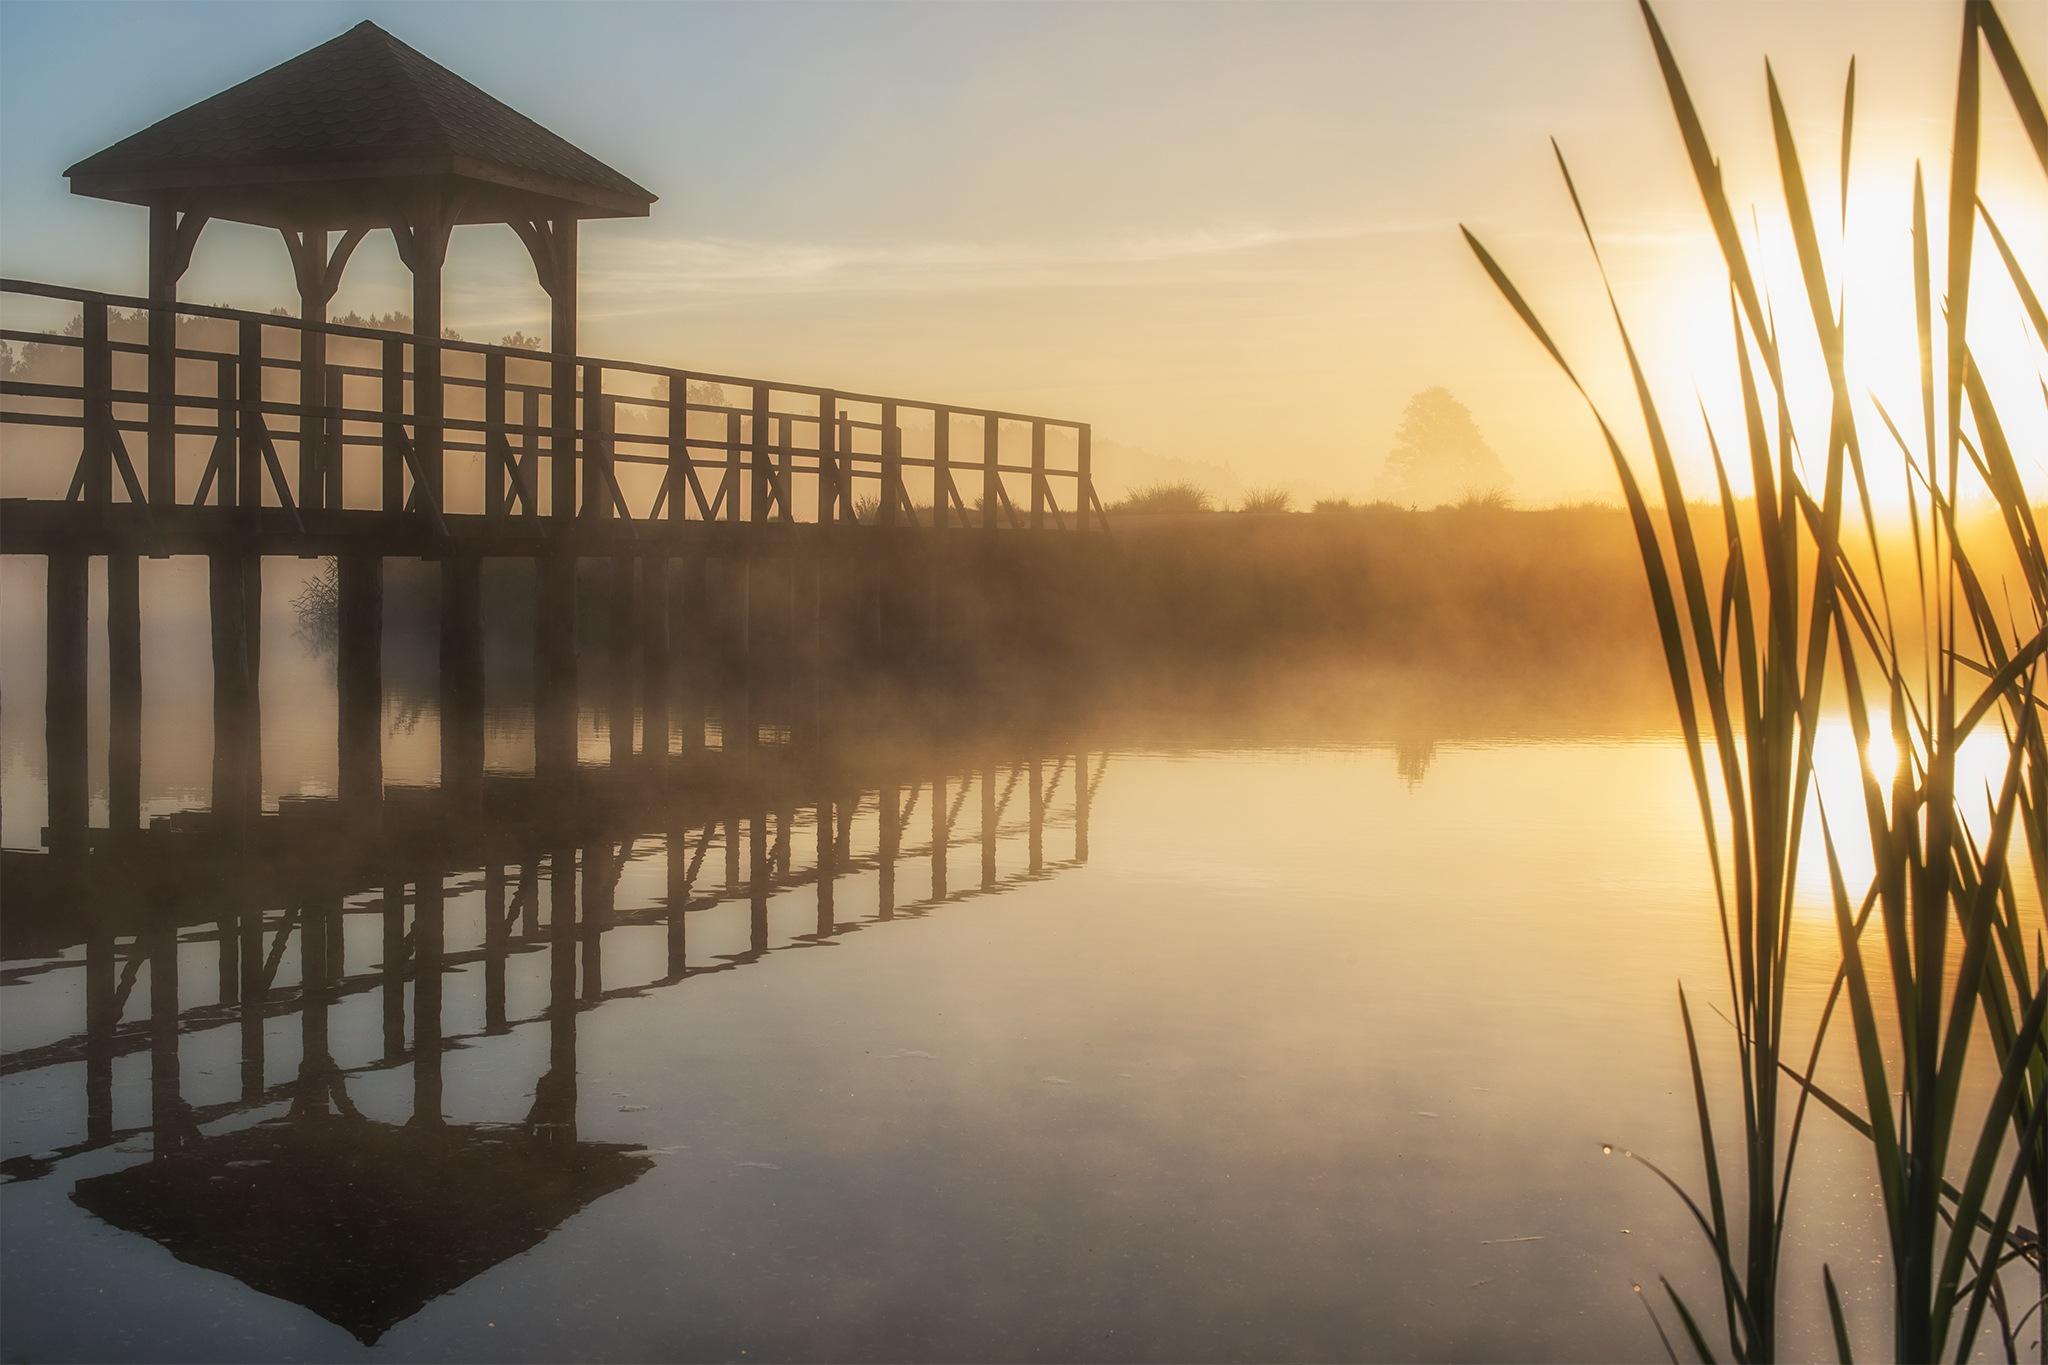 Misty Lake - part3 by Damian Pawlos